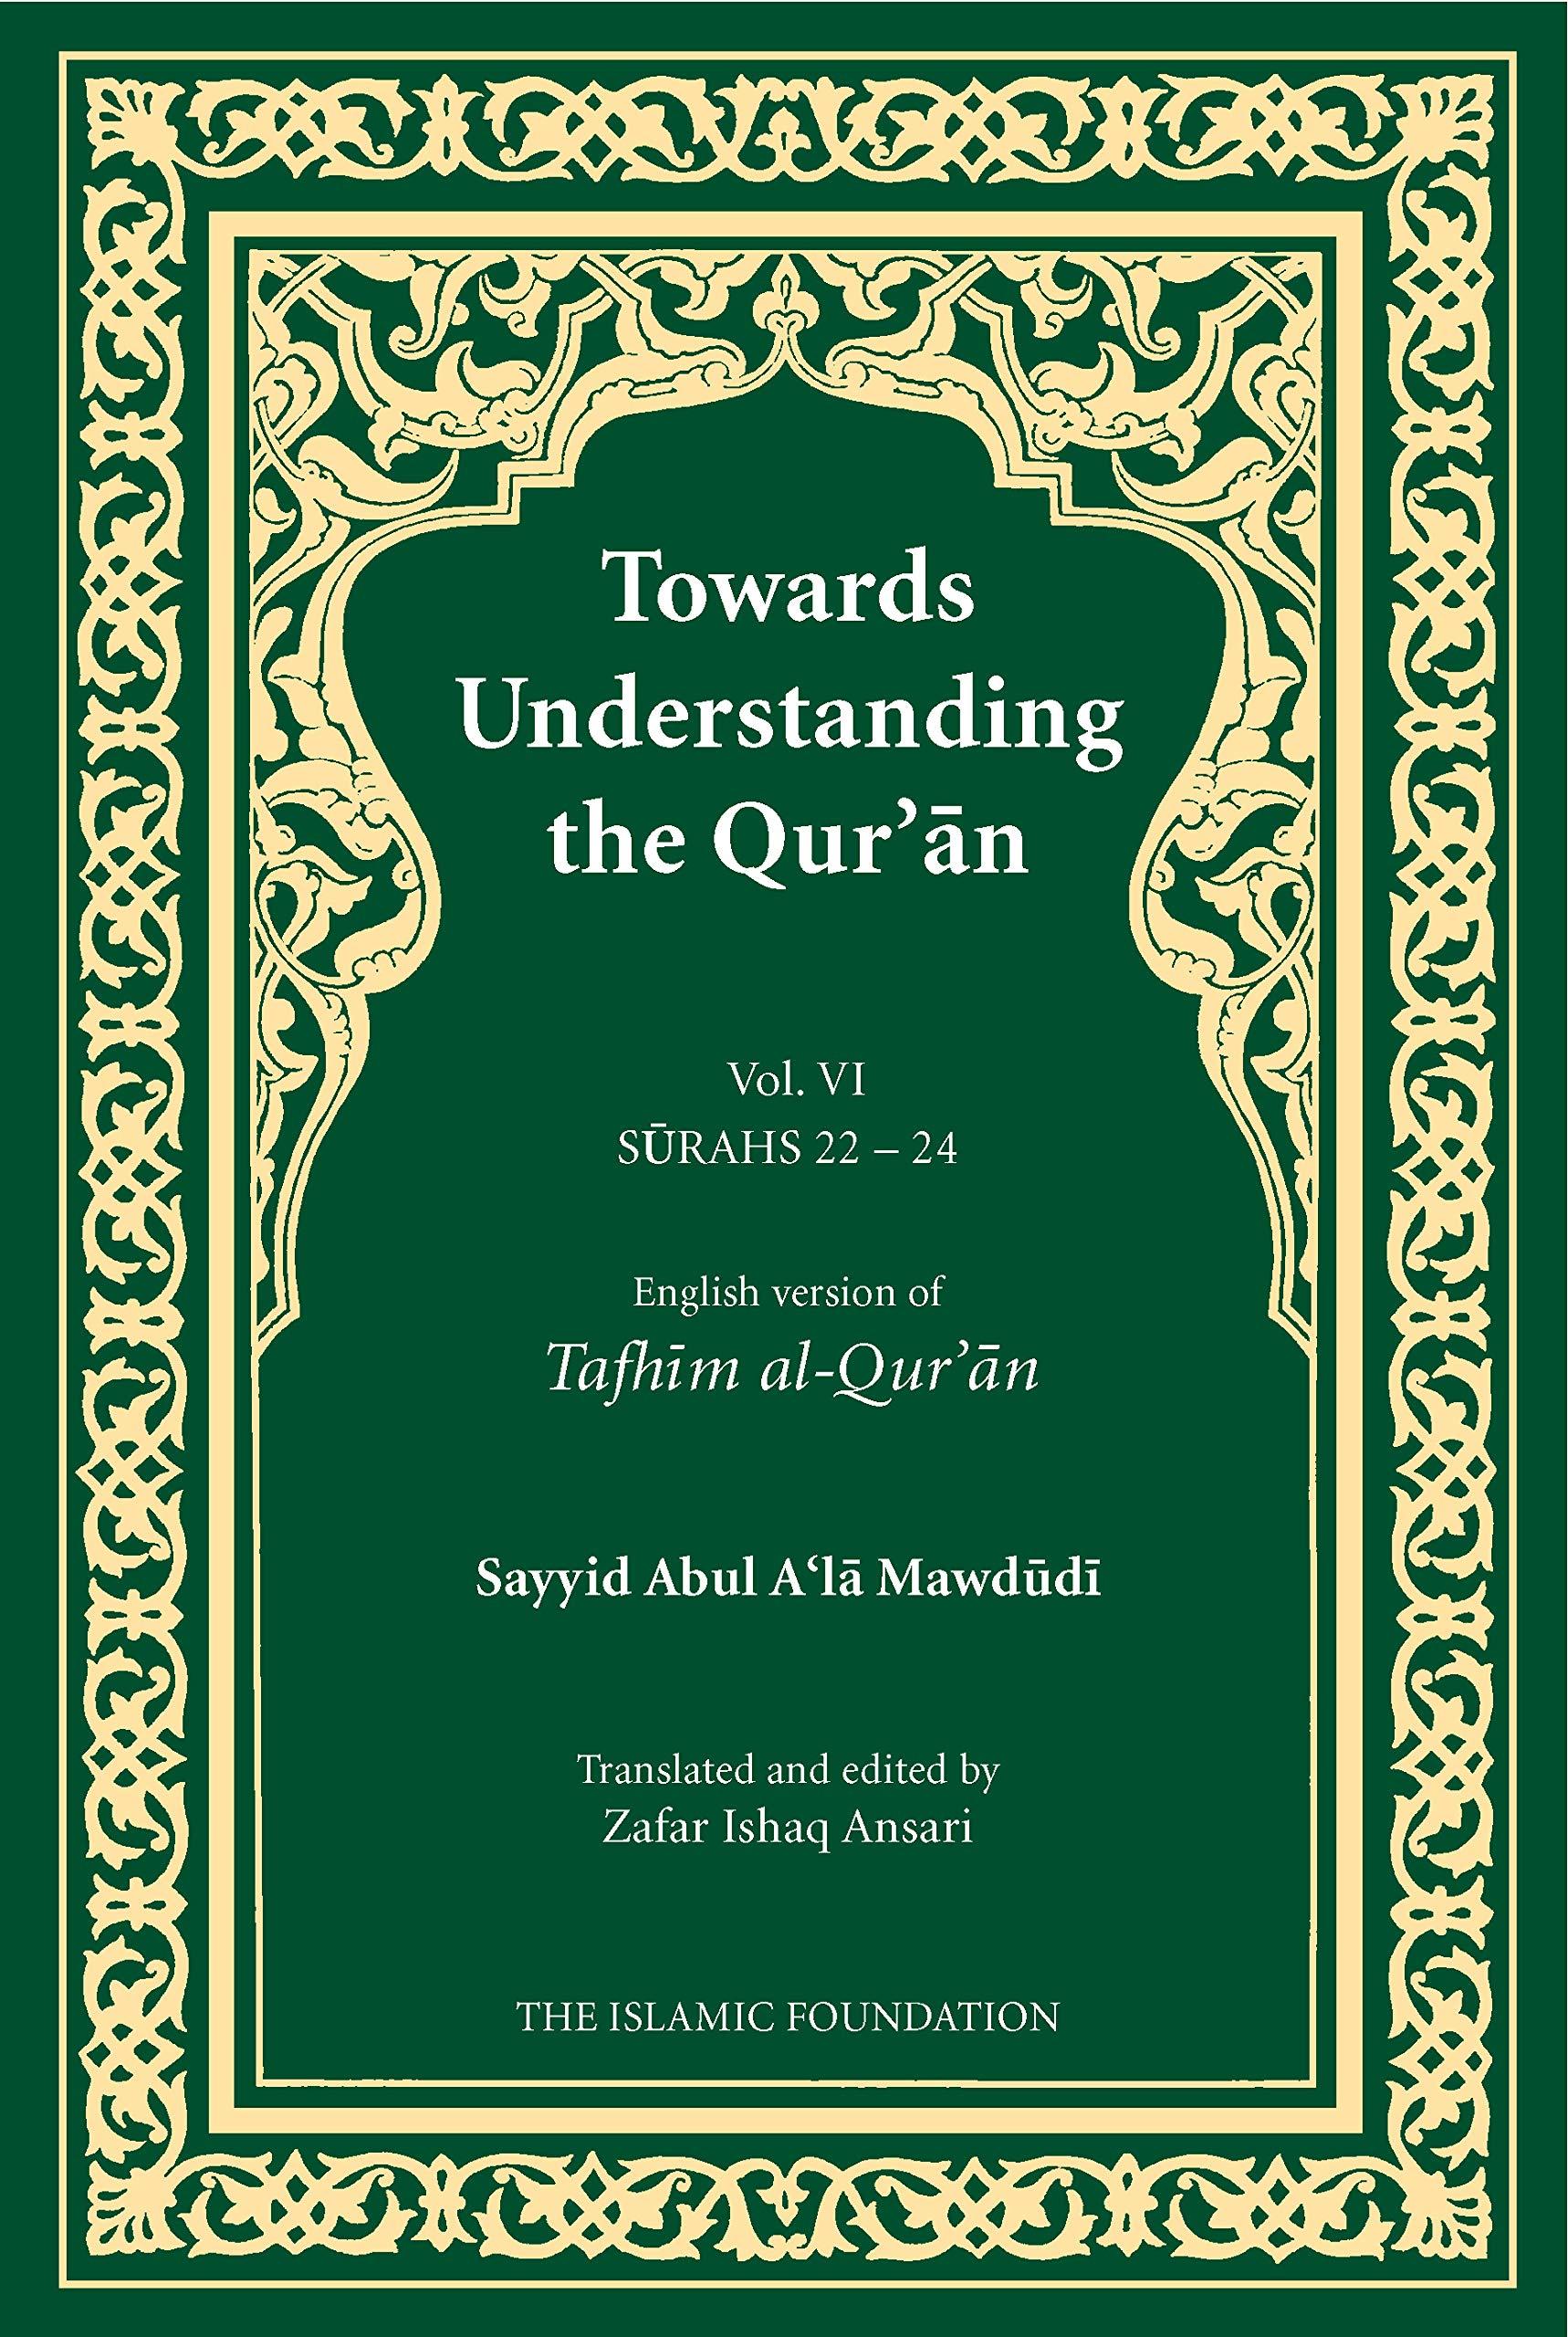 Towards Understanding the Qur'an (Tafhim Al-Qur'an) Volume 6